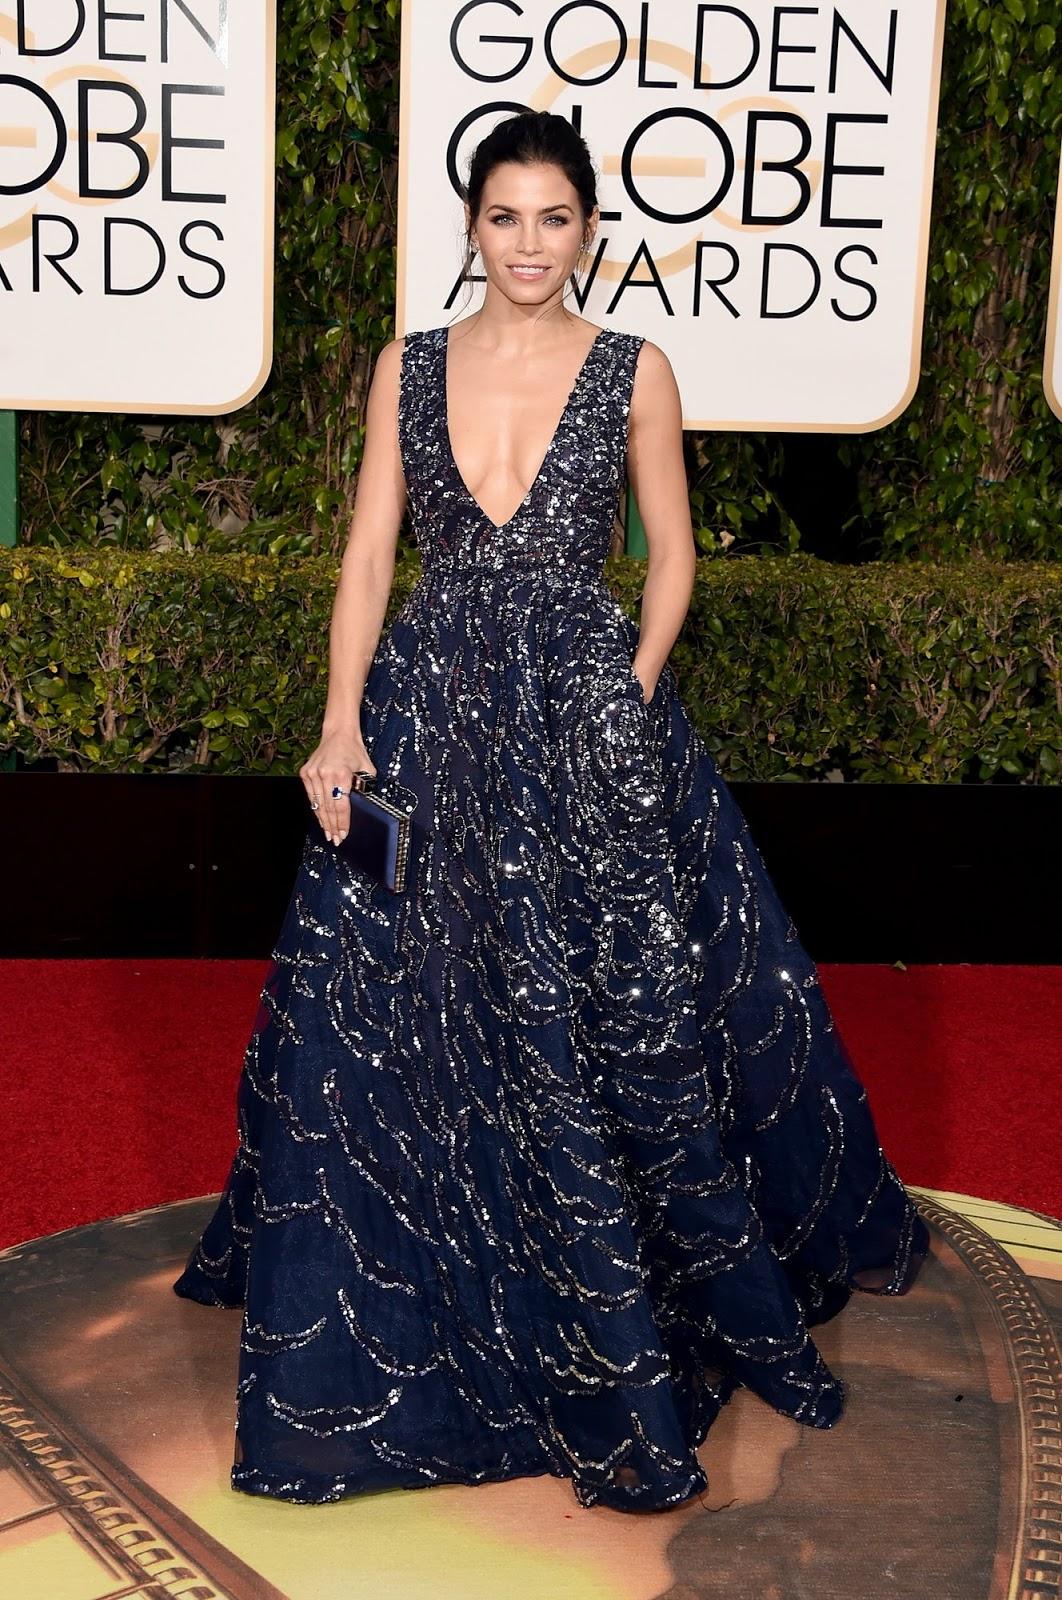 WHO WORE WHAT?....Golden Globe Awards 2016: Trend Alert! Ballgowns ...